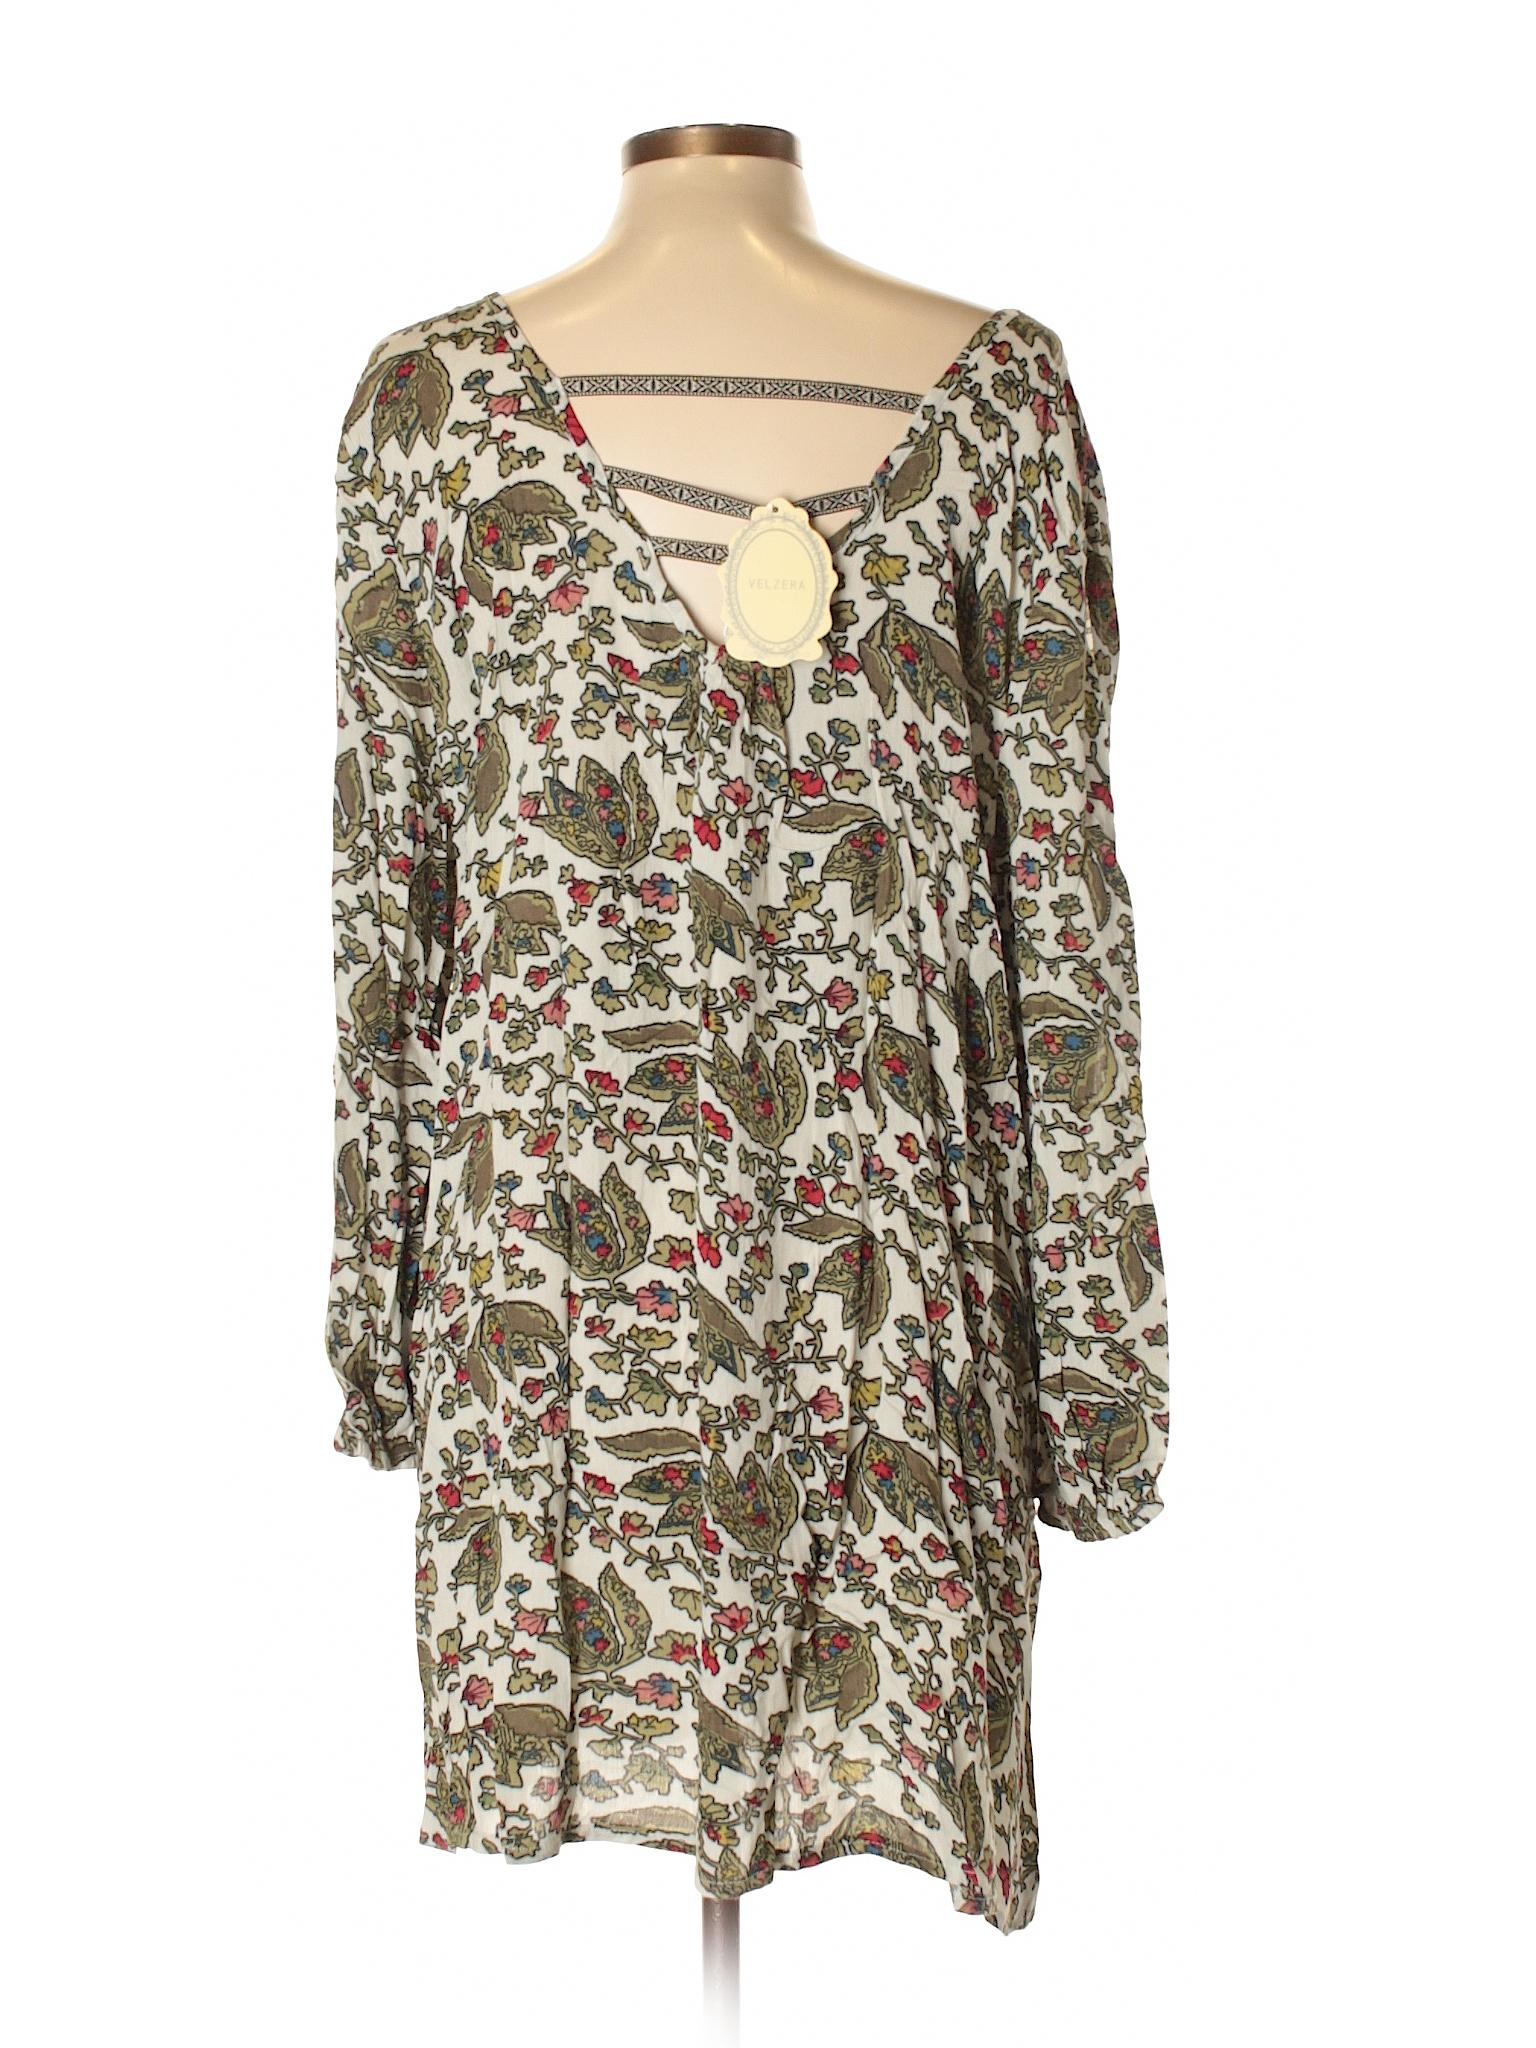 a42b62c15570 Women s Clothing